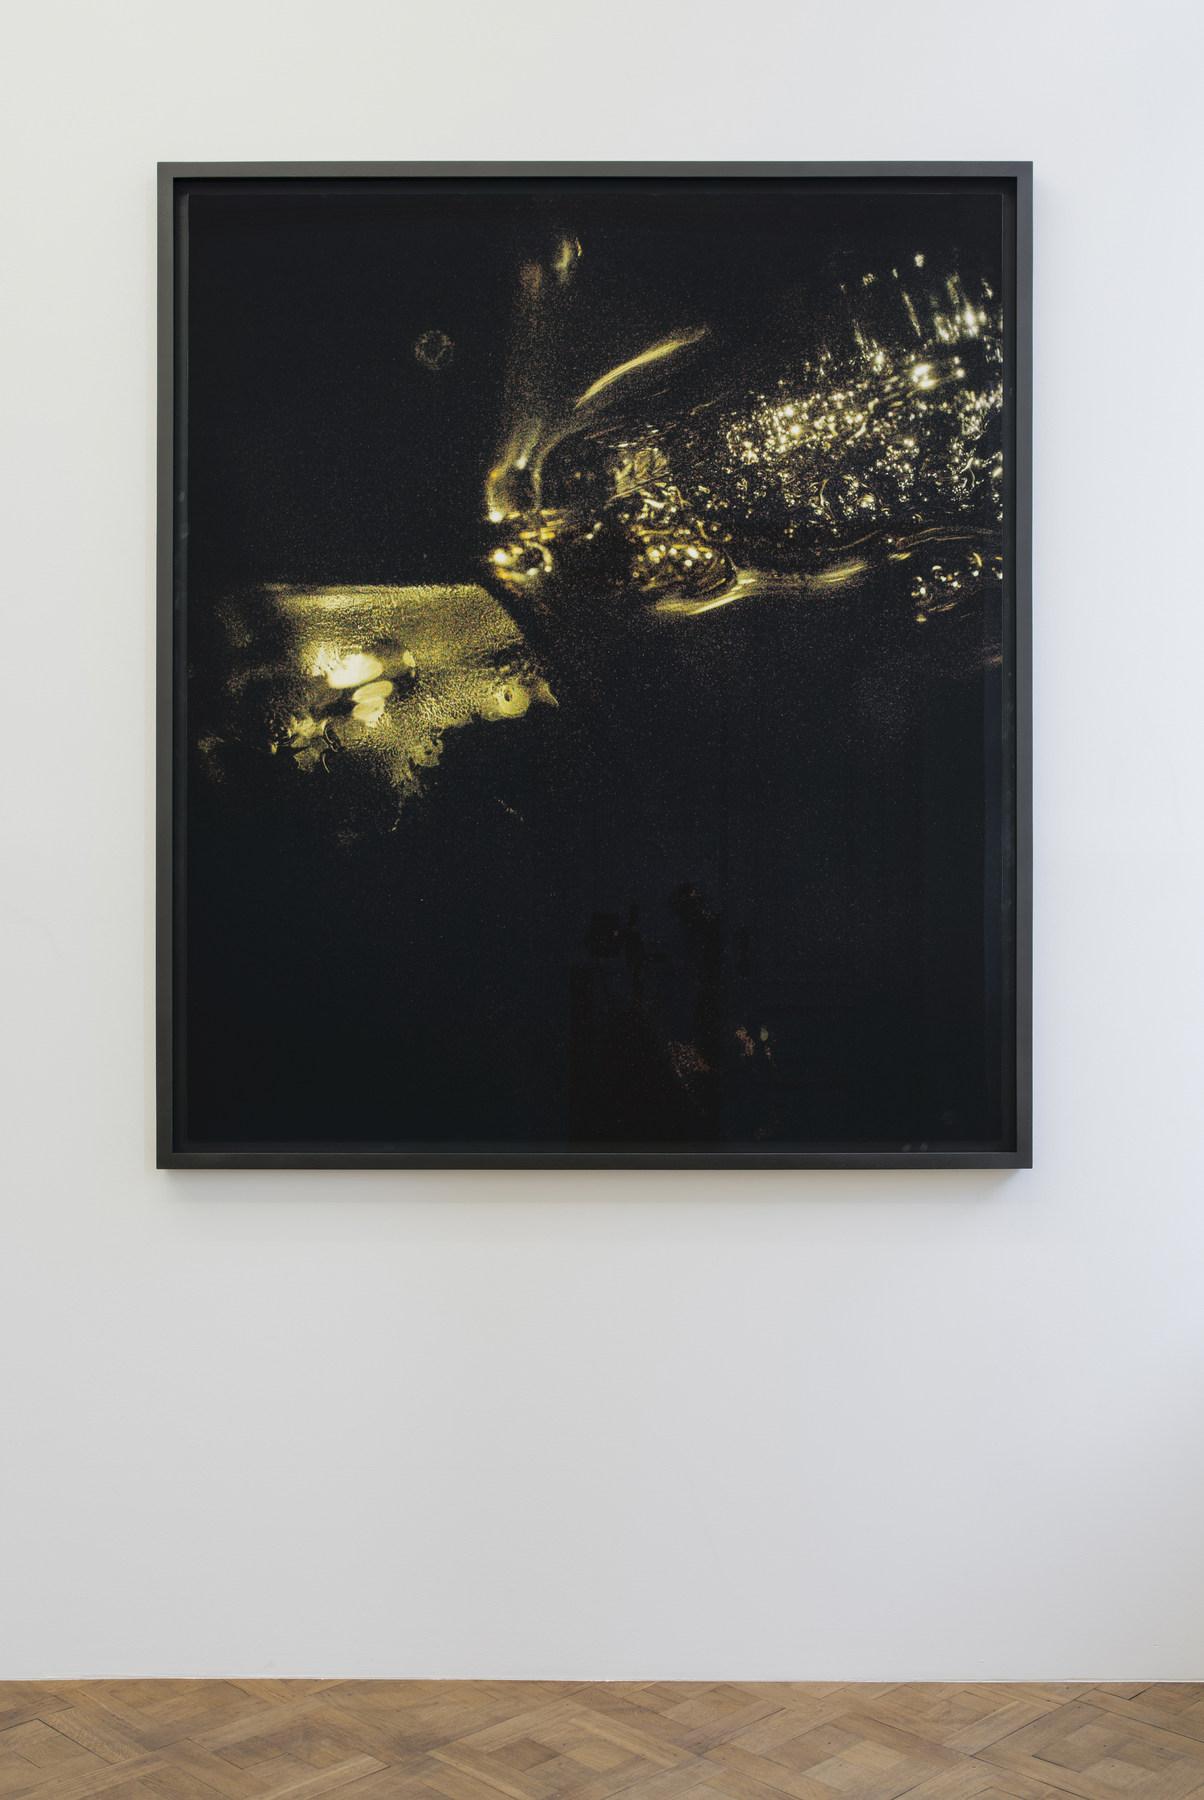 Melik Ohanian, Portrait of Duration — Cesium Series II T1902, 2016, Color photograph mounted on aluminium, 173 x 150 x 5cm (framed), 1_1 + 1 AP